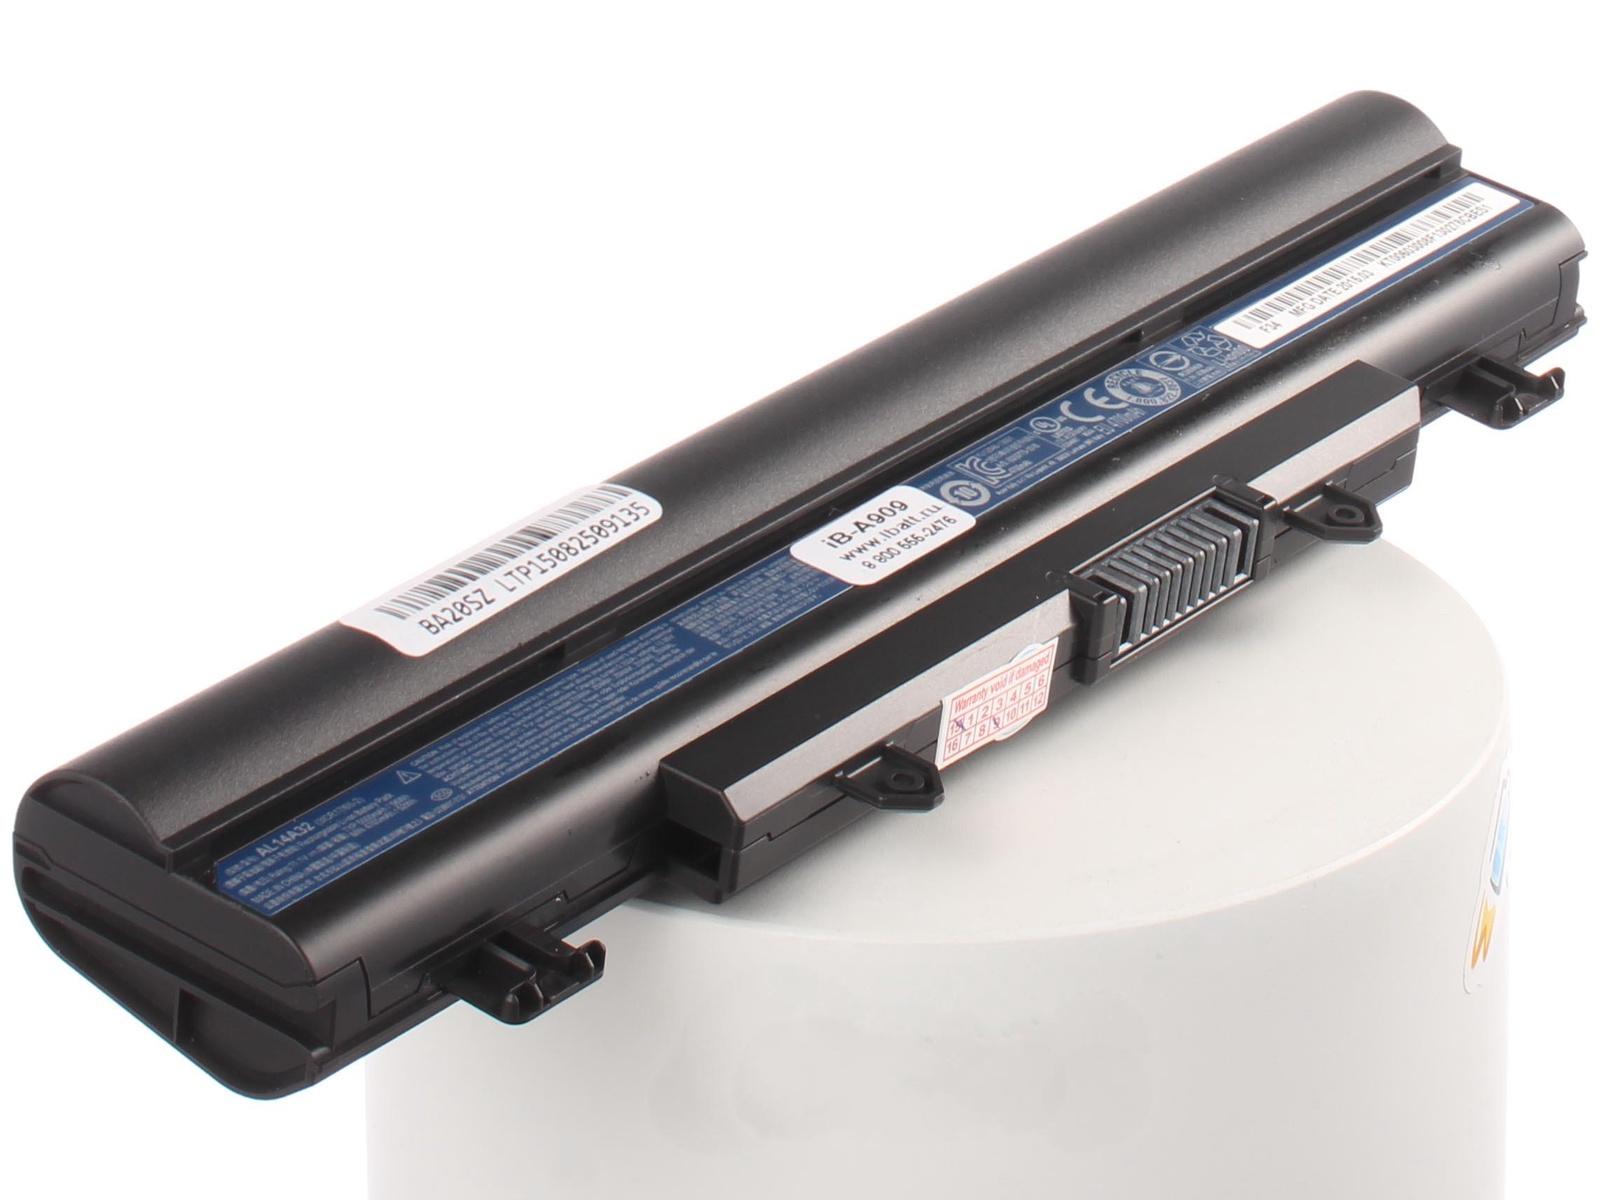 Аккумулятор для ноутбука iBatt для Acer Aspire E5-572G, ASPIRE E5-511-P23U, ASPIRE E5-511-P47U, Aspire E5-521G-61UC, Aspire E5-571G-594Y, Aspire E5-511-C6LP, Aspire E5-571G-50Y5, Aspire E5-571G-56A6, Extensa 2510G-345E ноутбук acer aspire e5 576g 31sj nx gvber 031